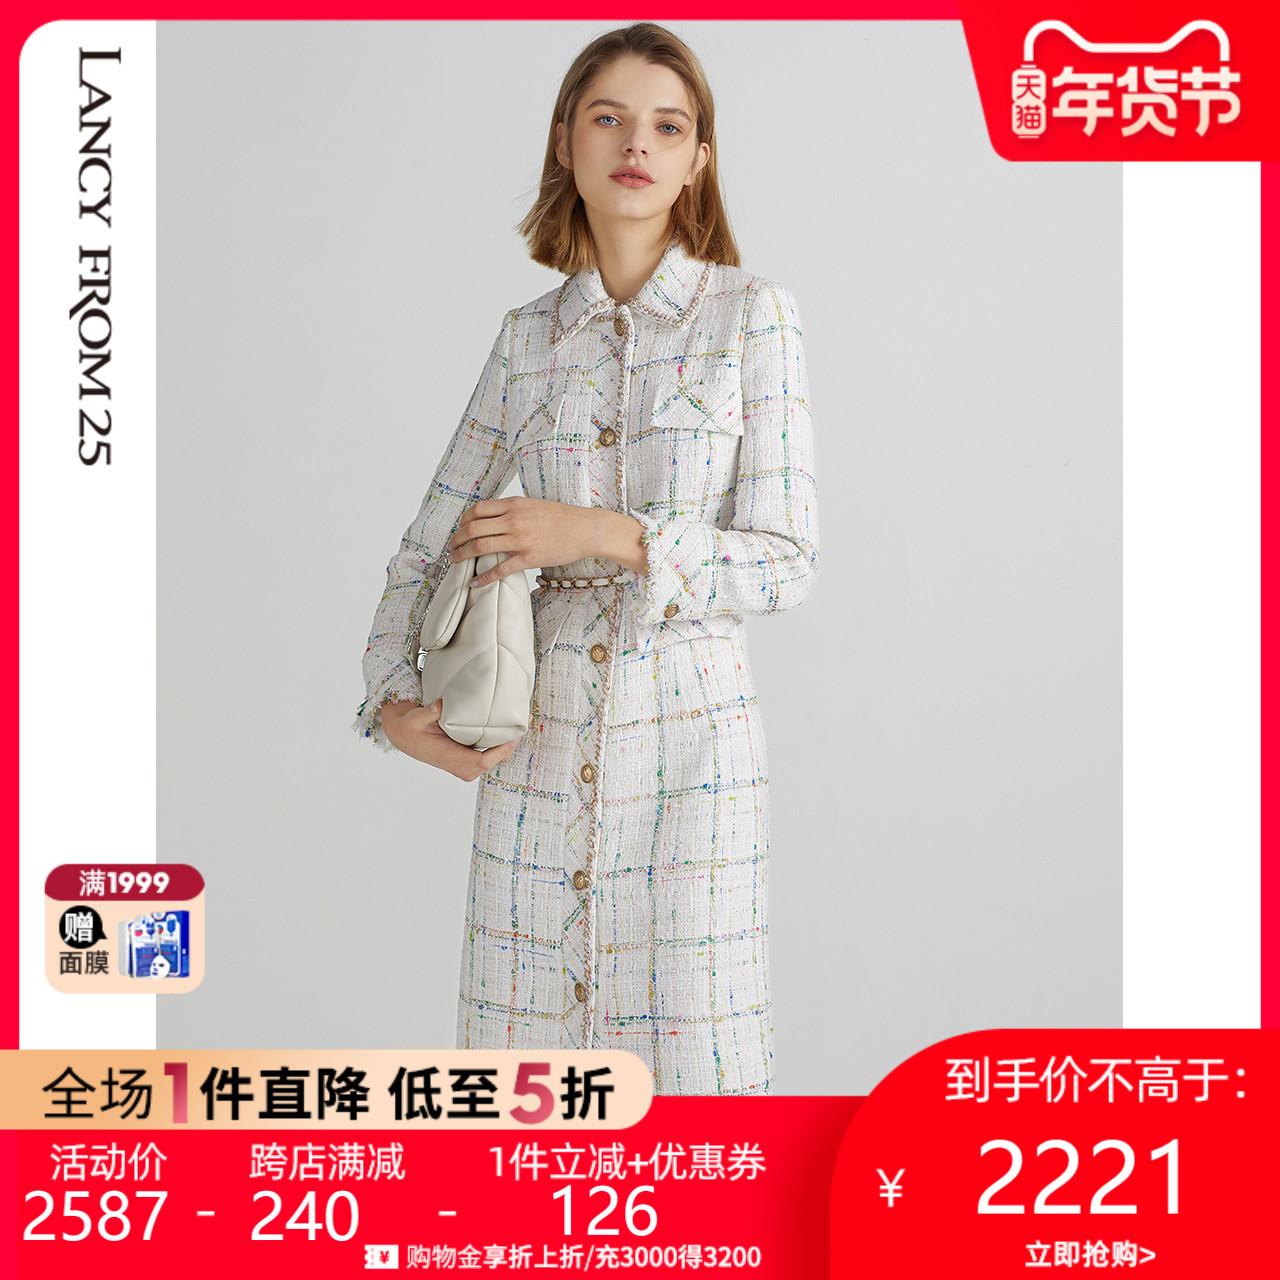 Langzi high-cut textured braided fabric spring 2021 new medium-length version of the windcoat jacket dress